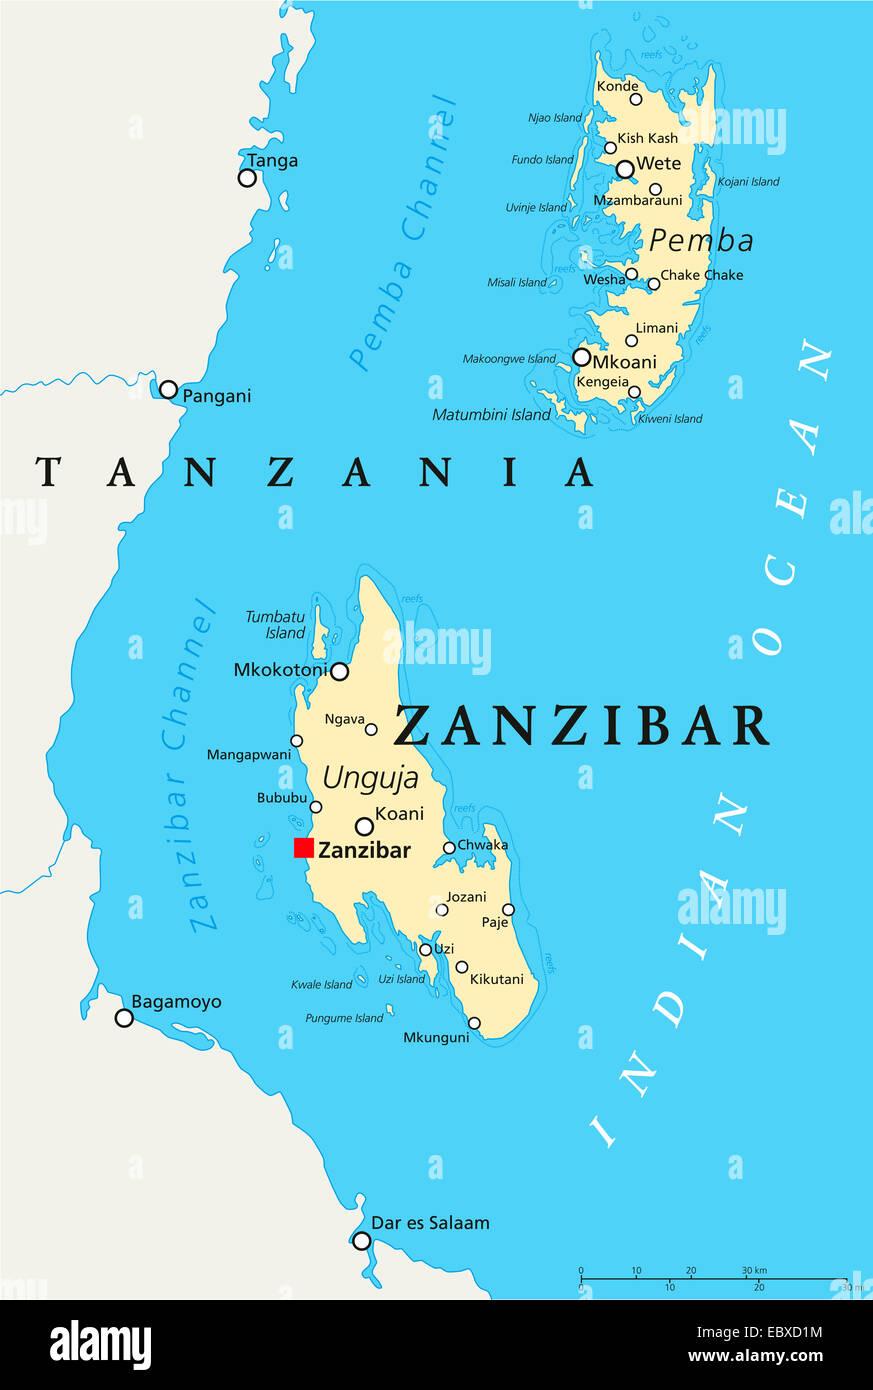 Zanzibar Political Map Stock Photo - Alamy